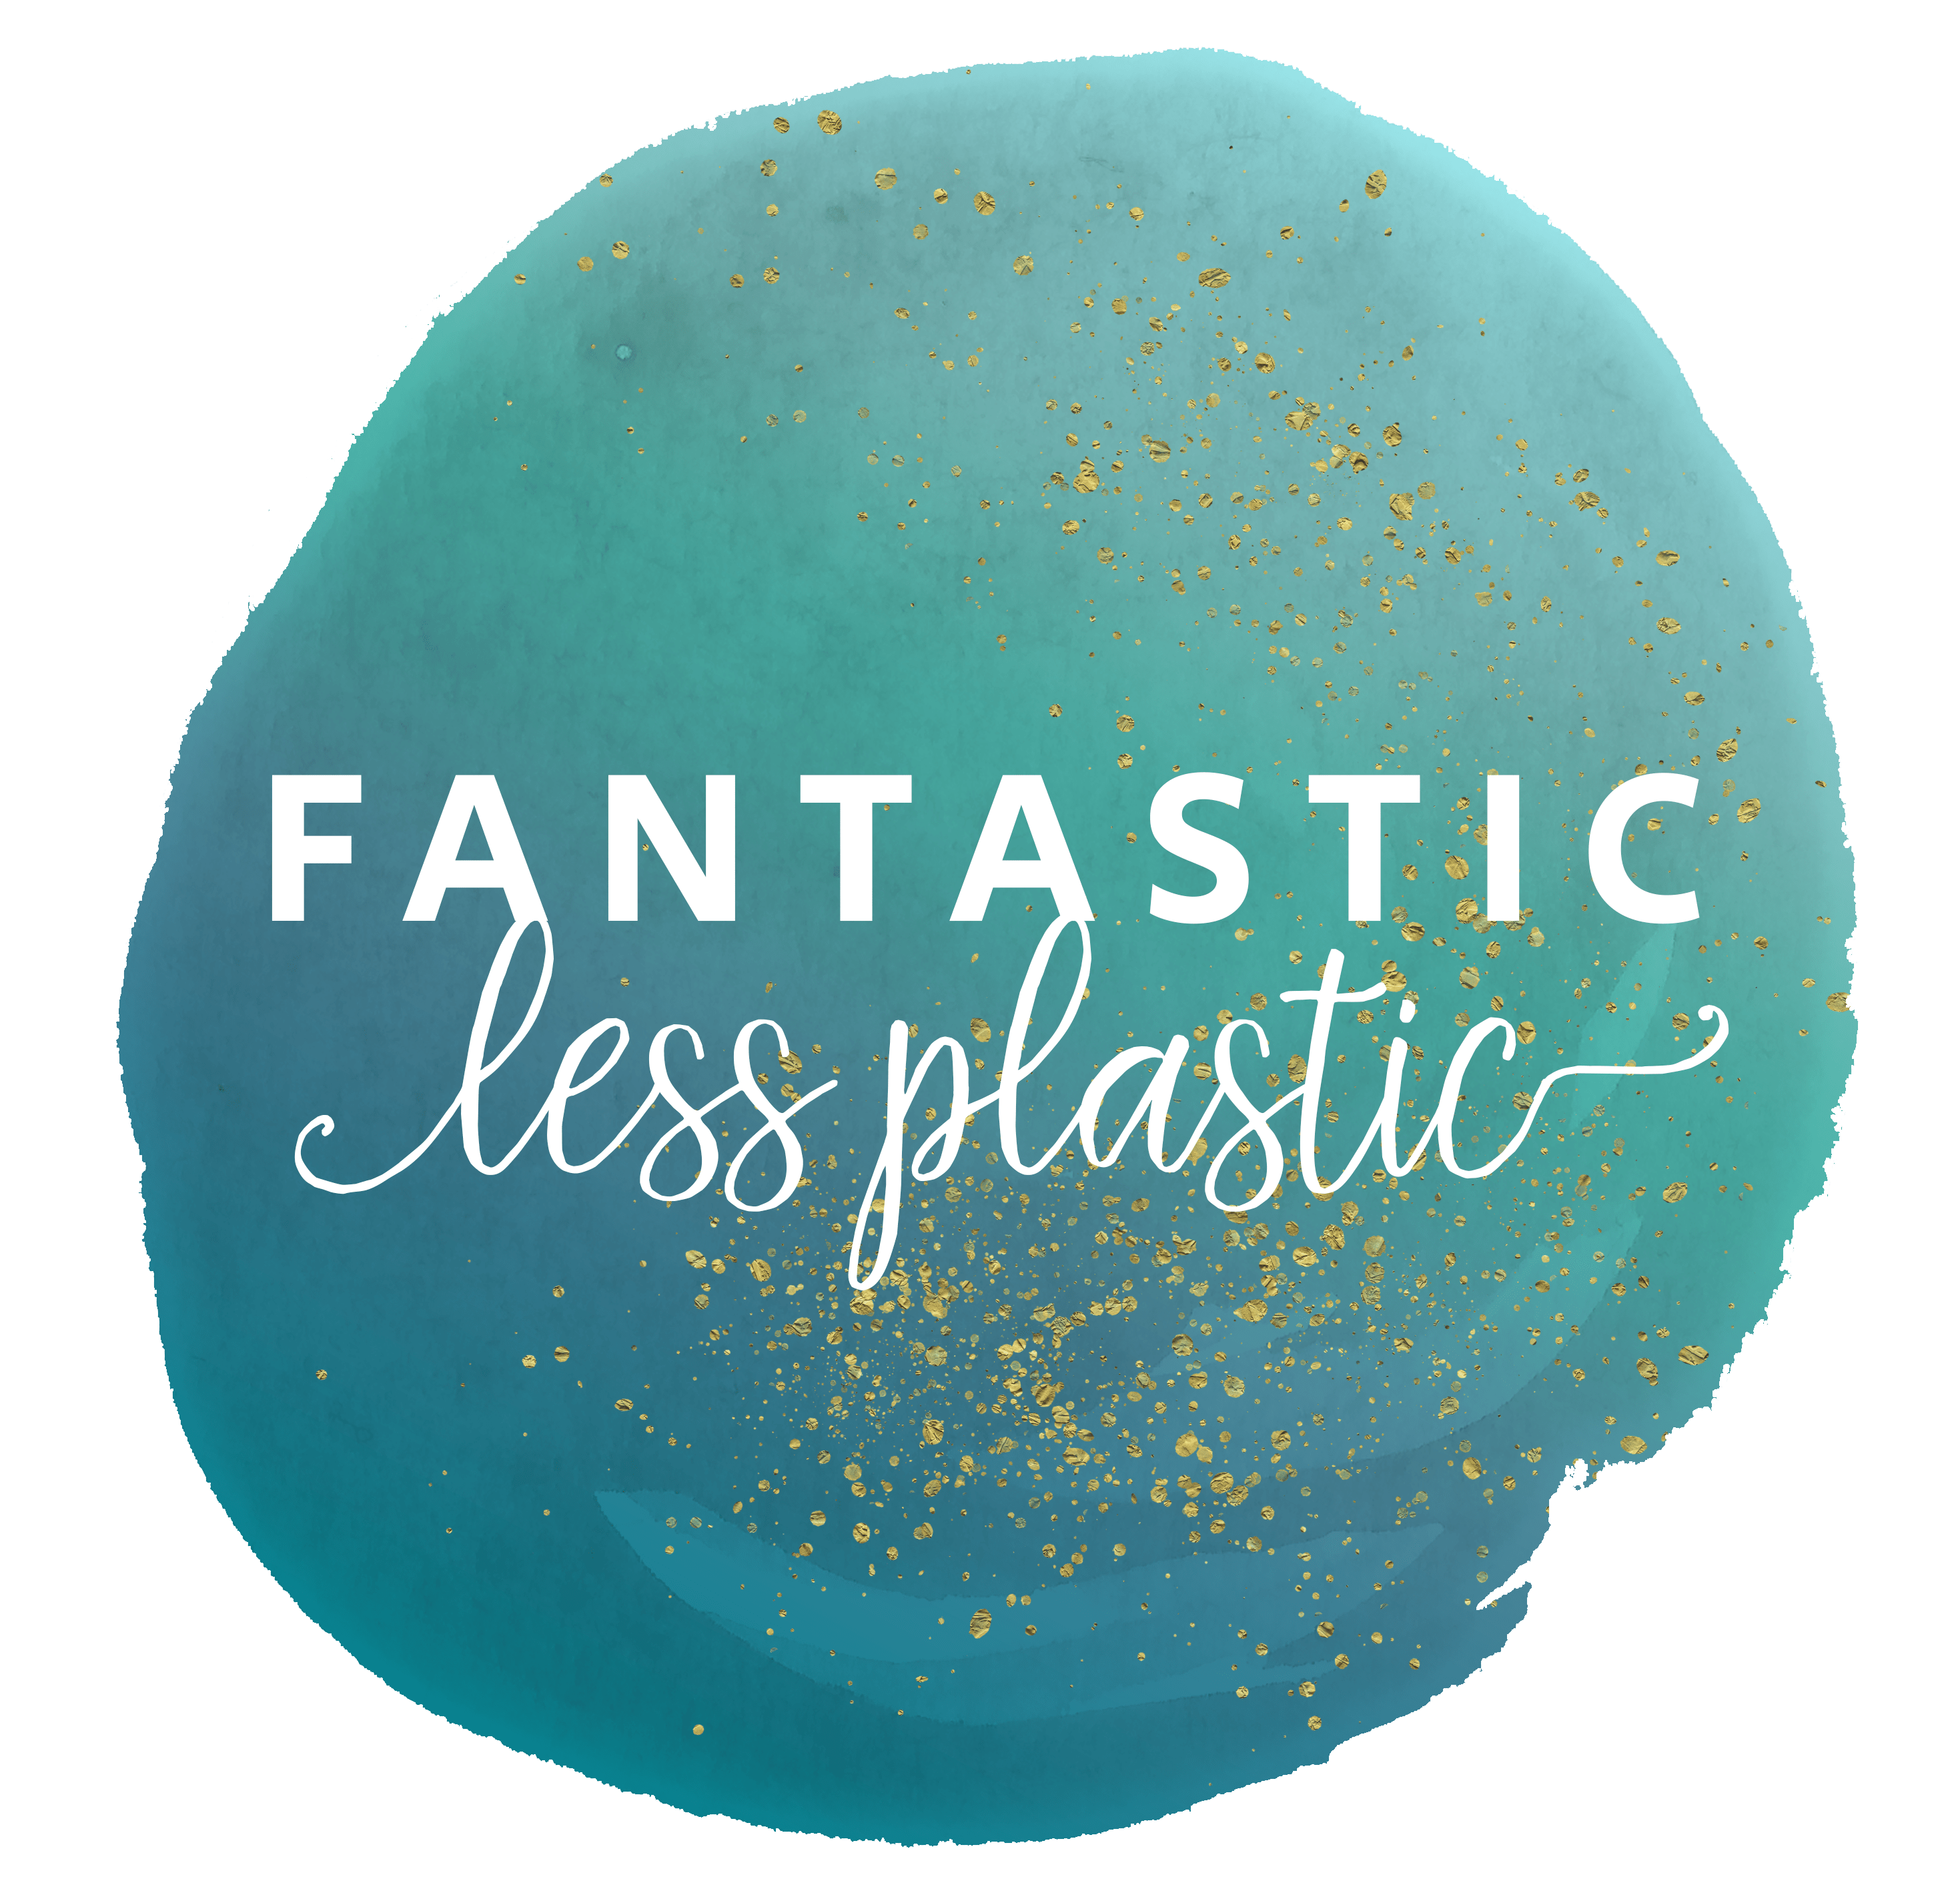 Fantastic less plastic